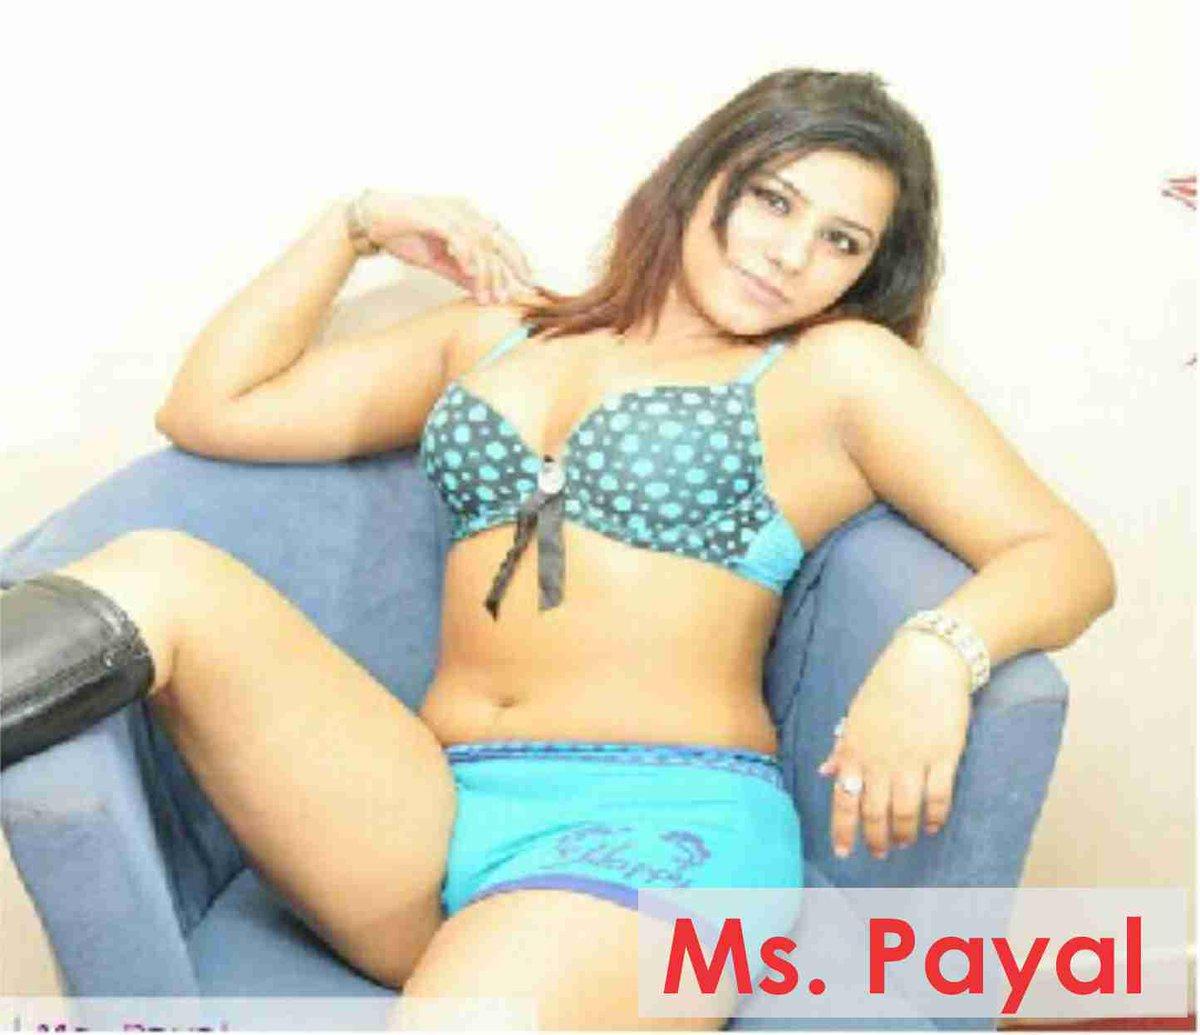 Payal escort service, aurangabad